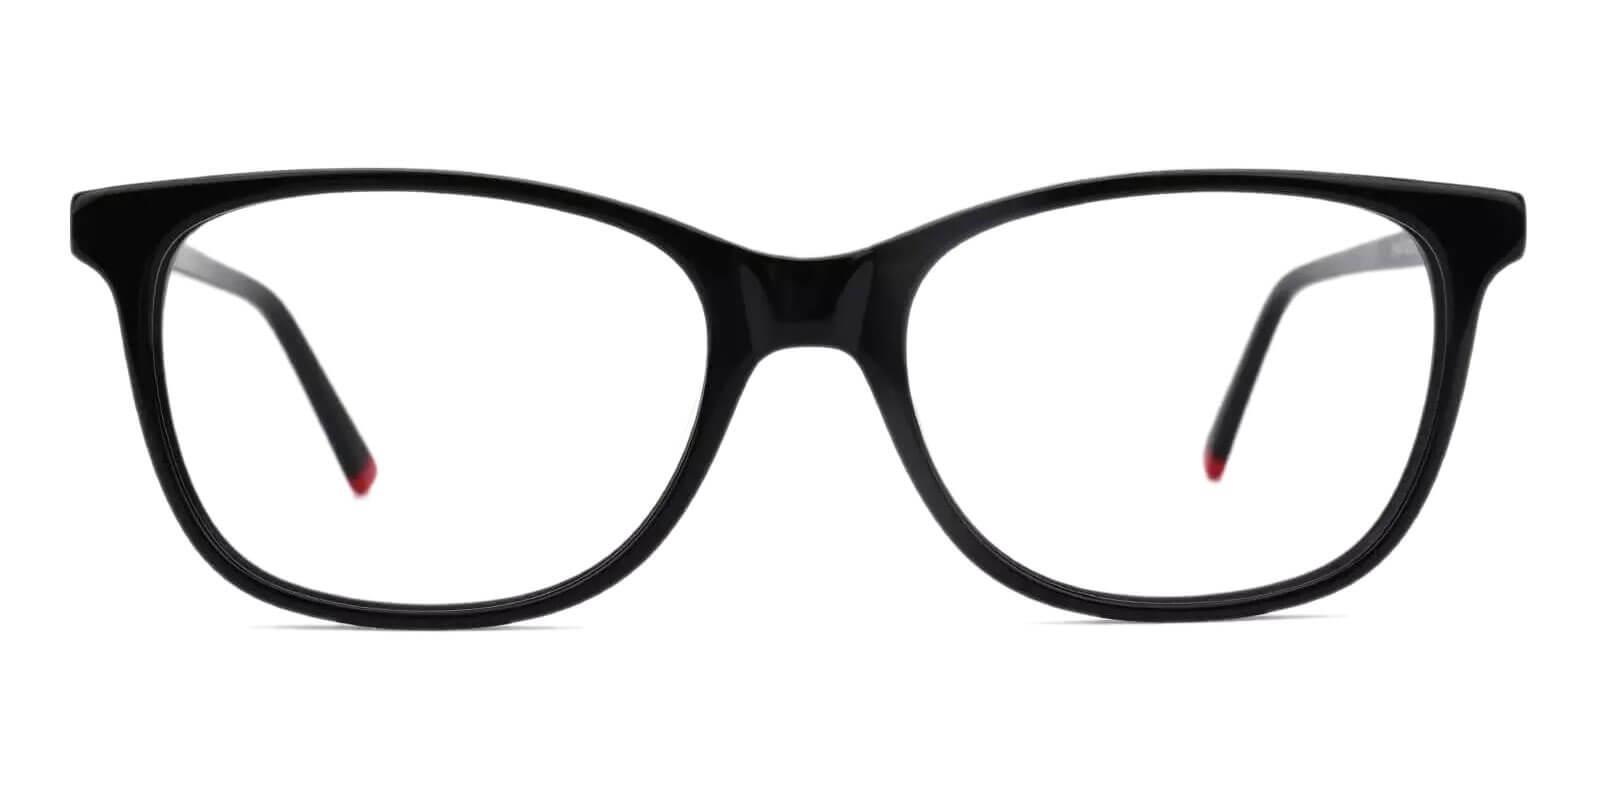 Hibbard Black Acetate Eyeglasses , SpringHinges , UniversalBridgeFit Frames from ABBE Glasses